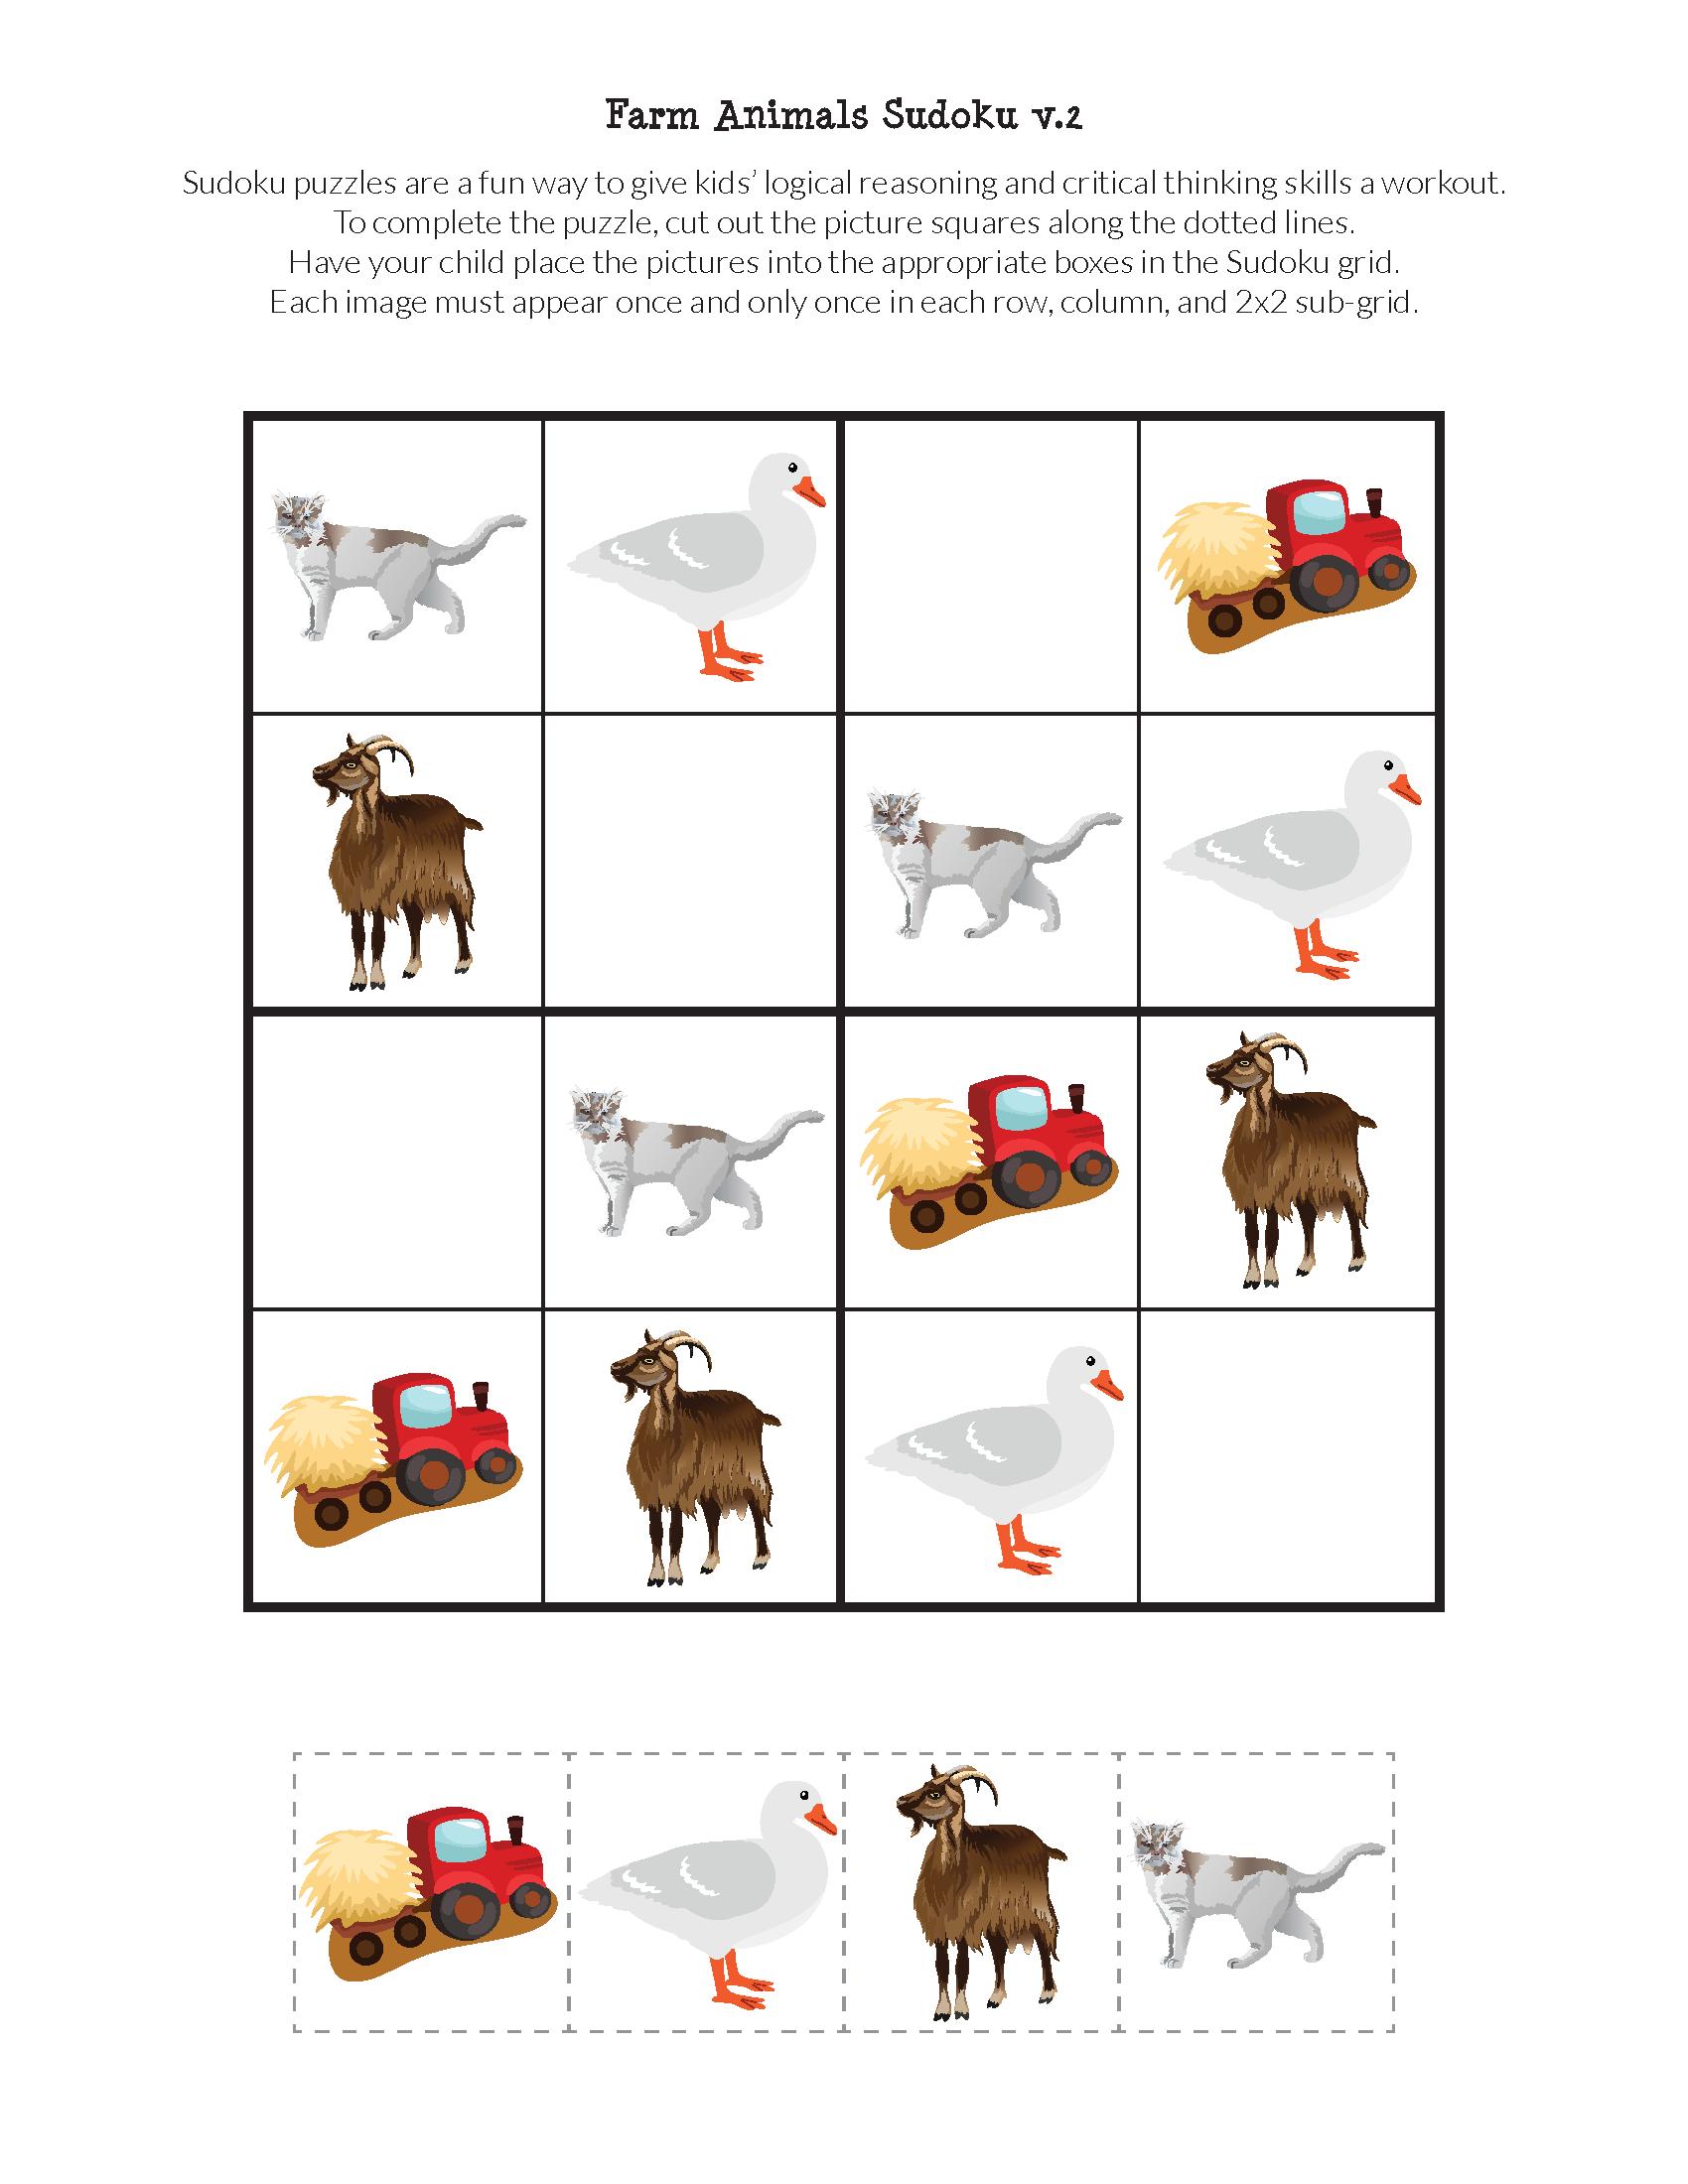 Farm Animals Sudoku Puzzles {Free Printables} - Gift Of Curiosity - Printable Animal Puzzles